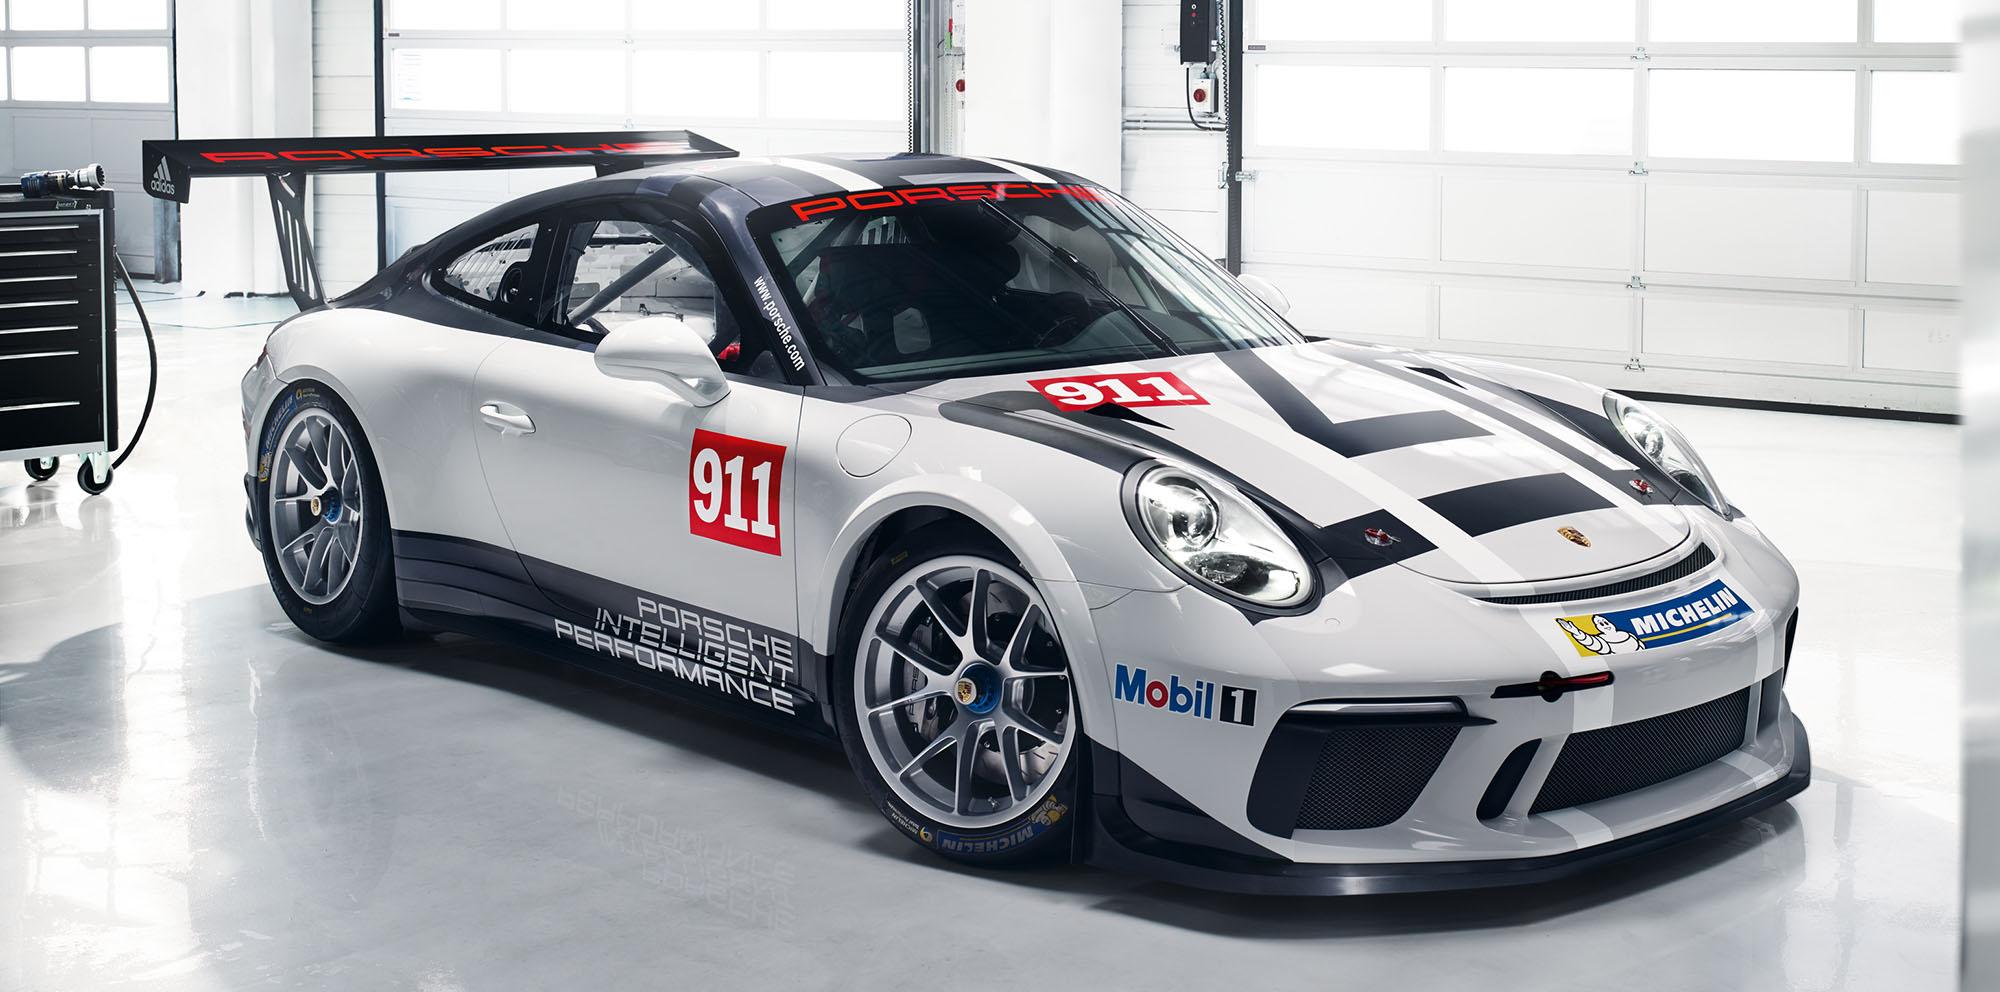 2017 porsche 911 gt3 cup race car unveiled photos 1 of 6. Black Bedroom Furniture Sets. Home Design Ideas